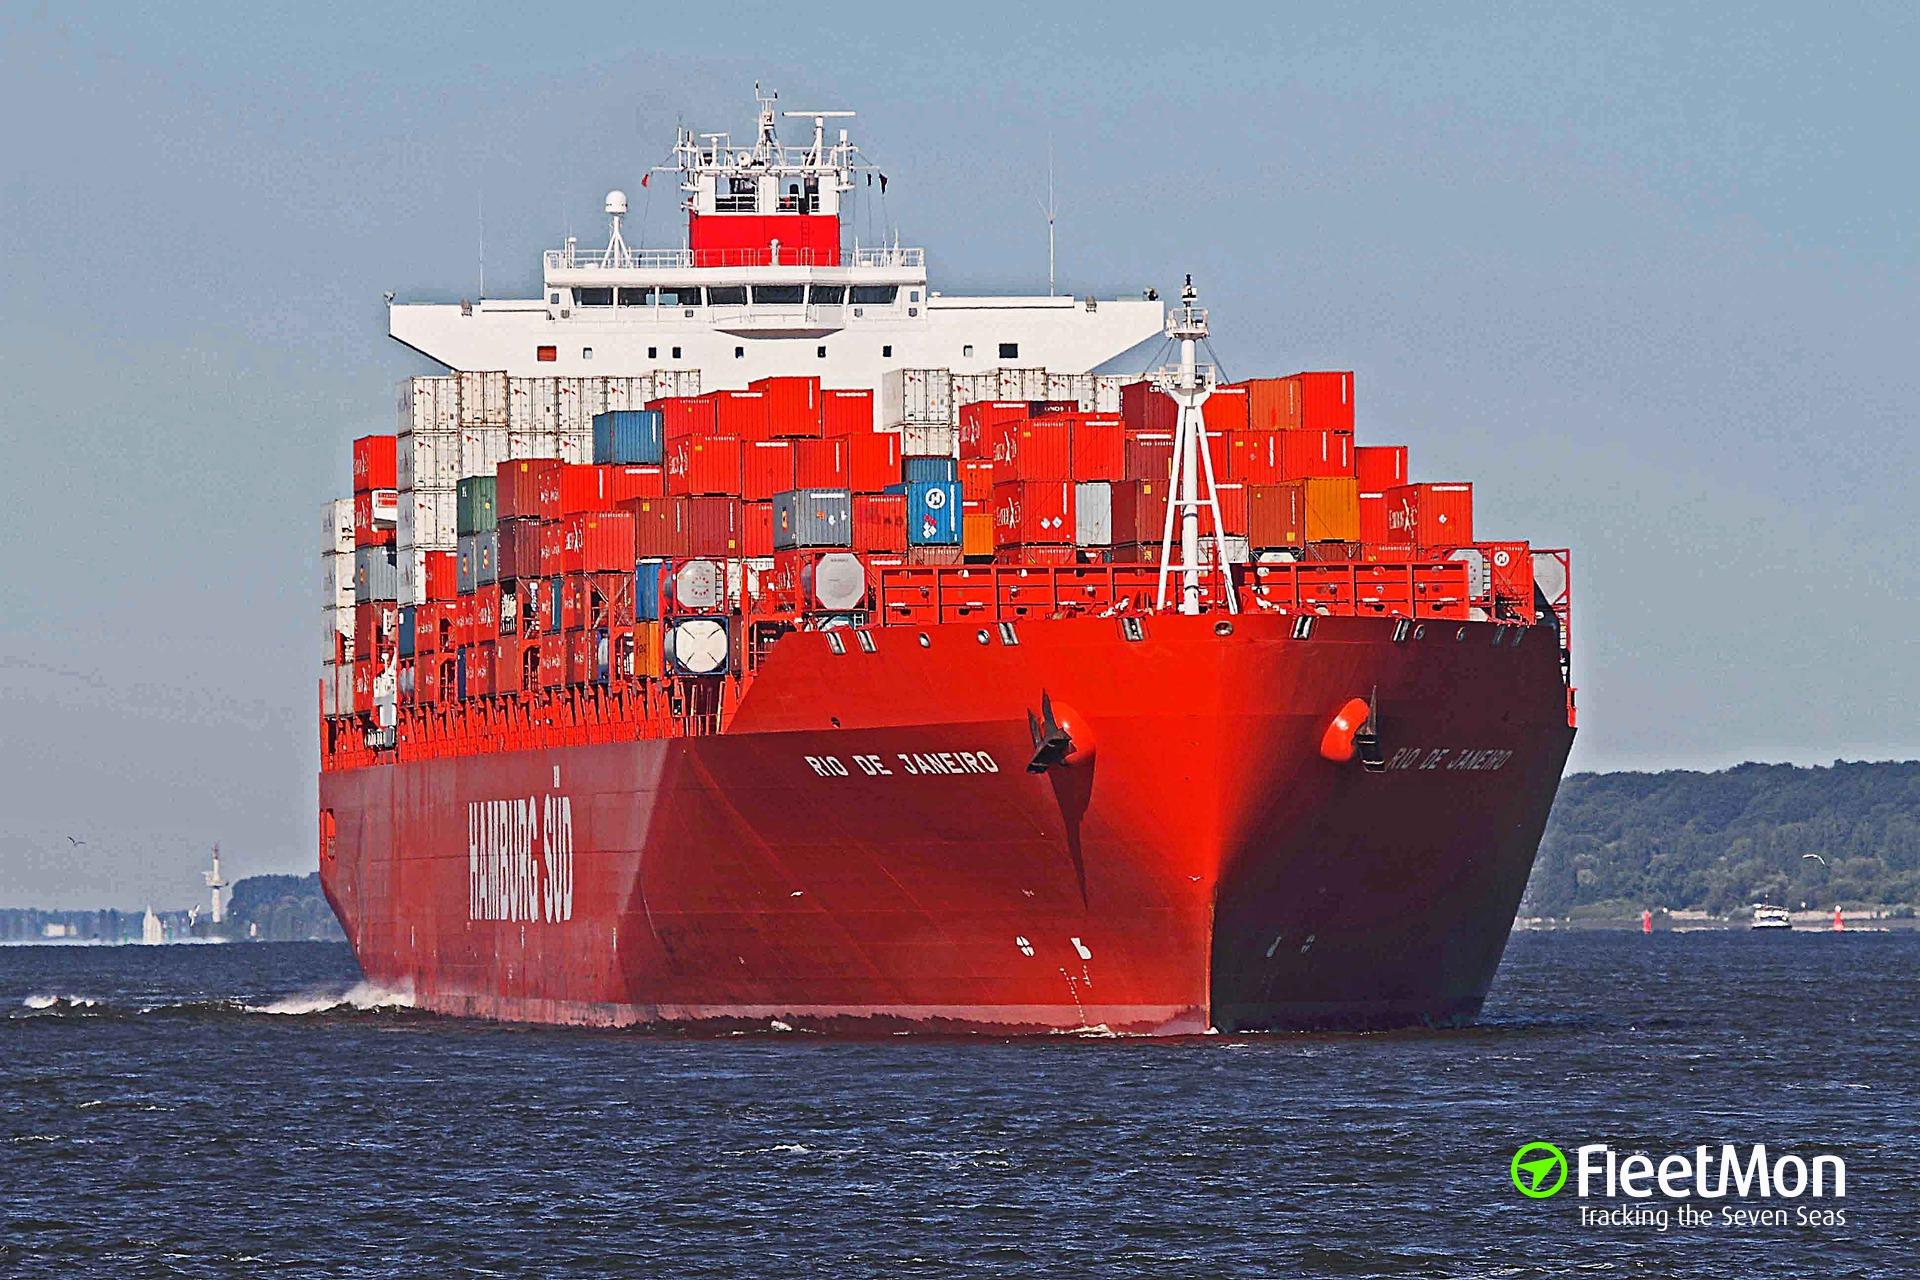 Hamburg-Sud boxship 385 kilo of cocaine intercepted, 9 crew arrested